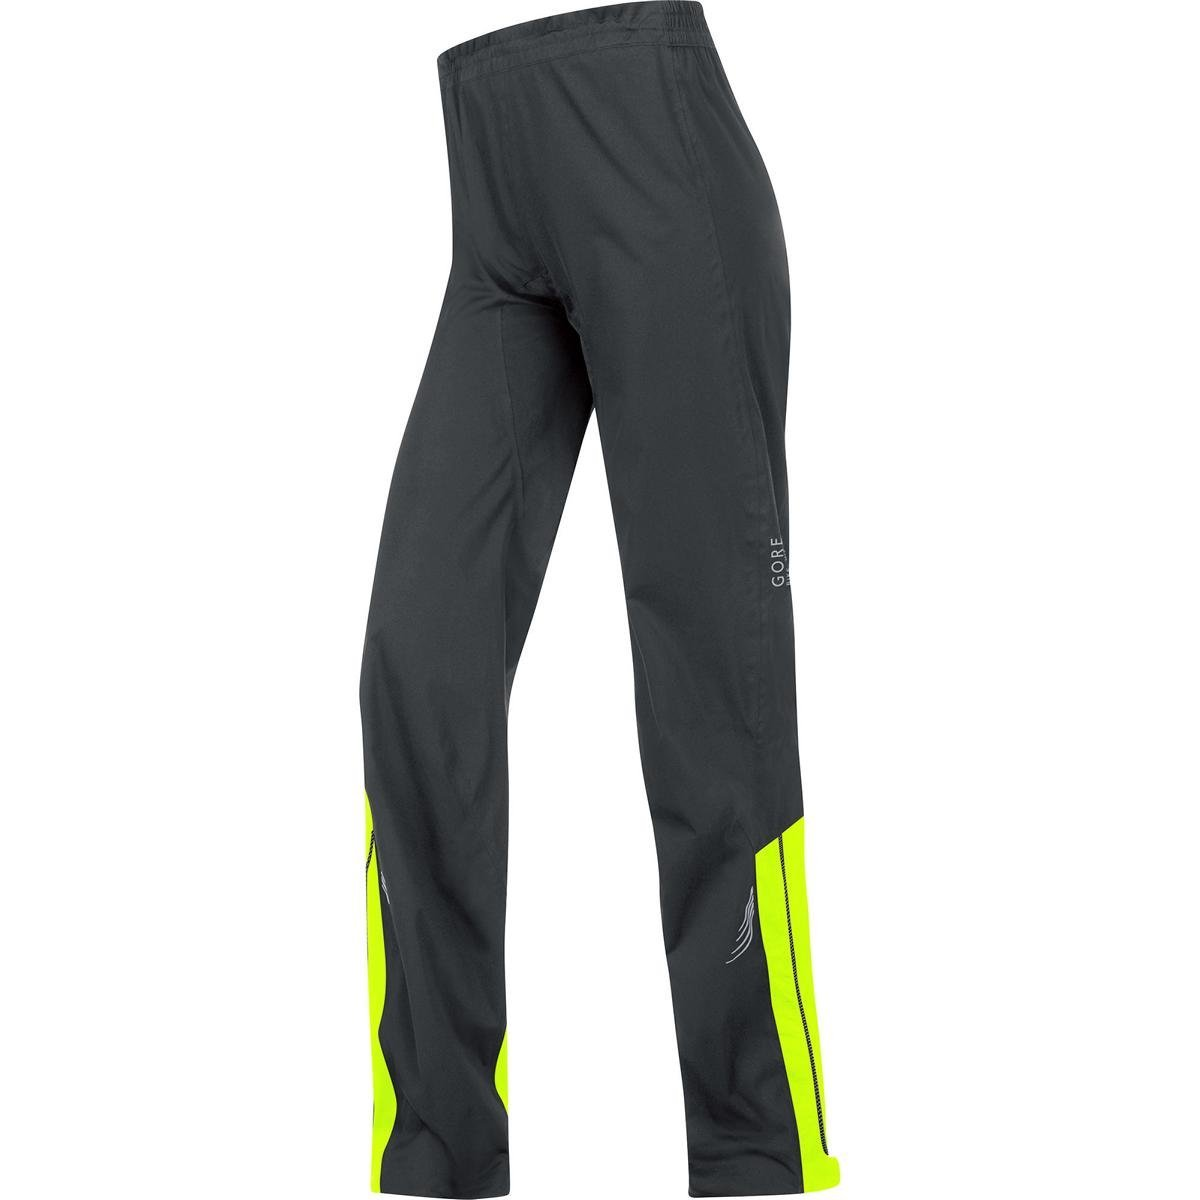 GORE BIKE WEAR Women's Long Rain Cycling Overtrousers, Super-Light, GORE-TEX Active, ELEMENT LADY GT AS Pants, PGDLEL PGDLEL-9900-S